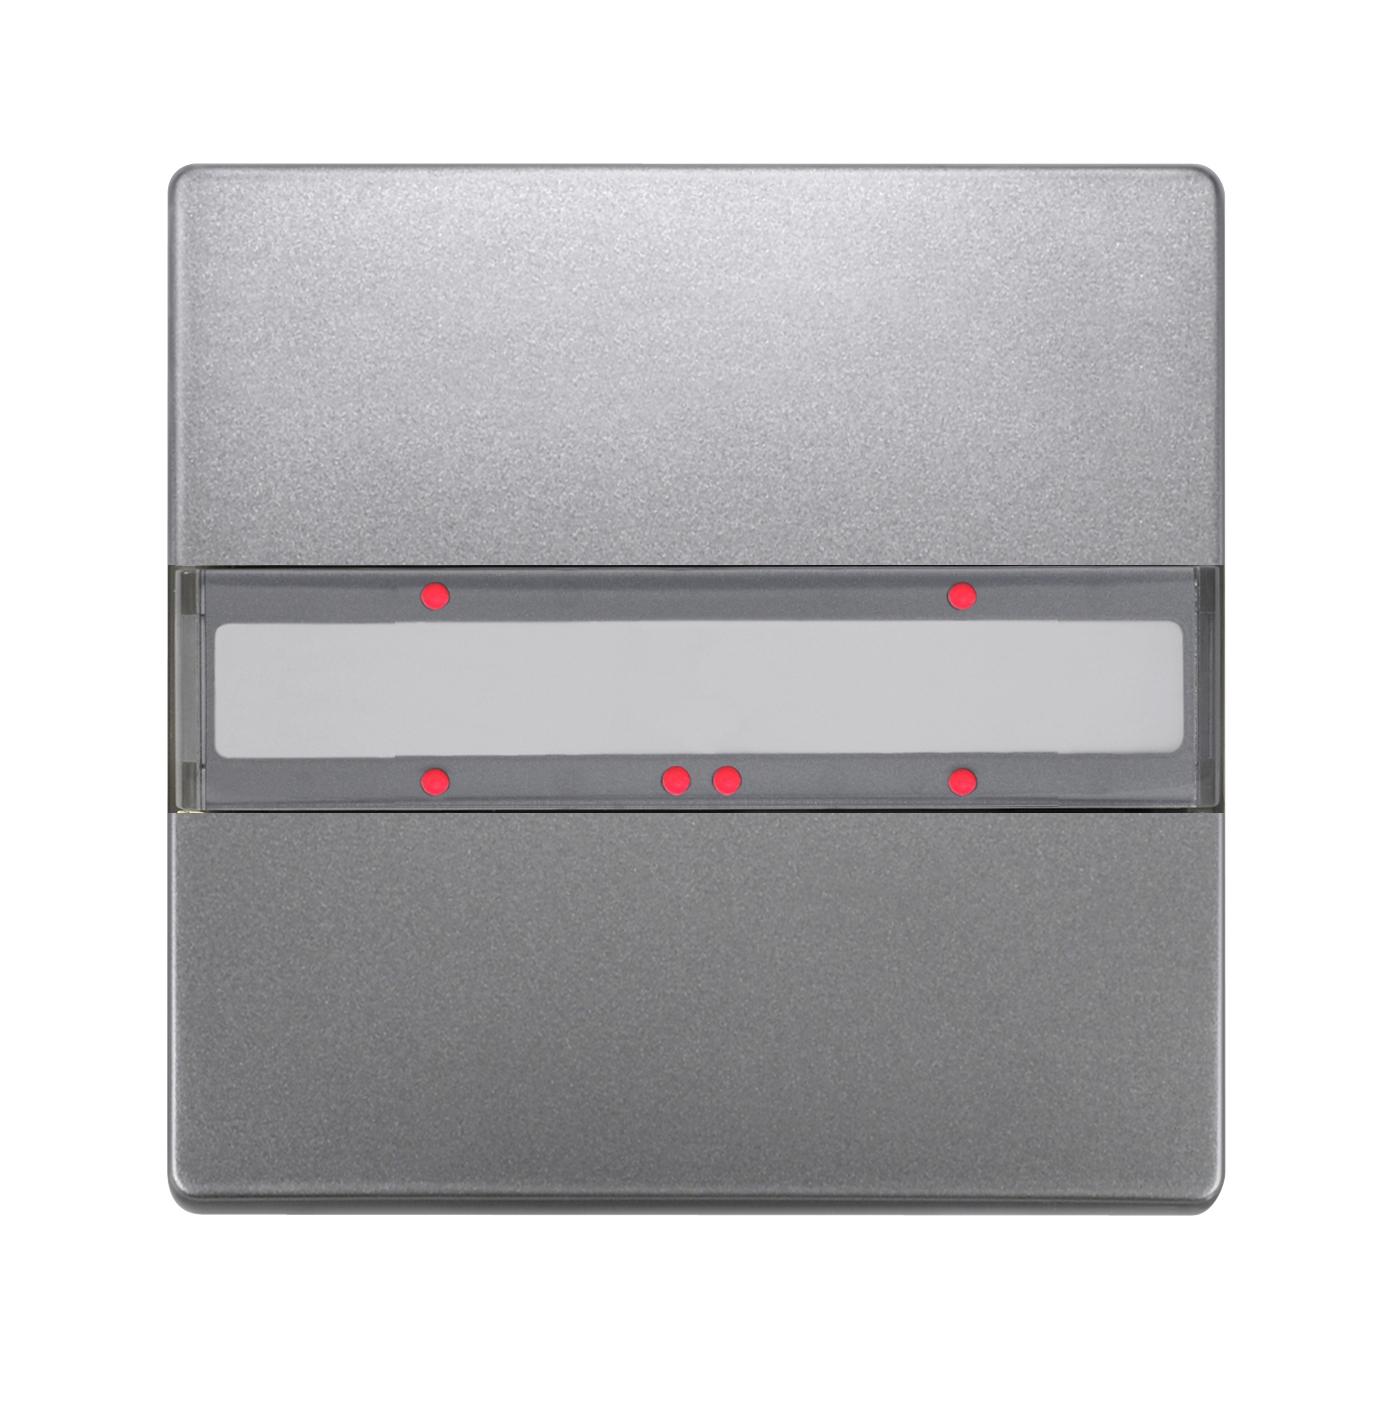 1 Stk Taster 1-fach mit Status-LED, DELTA style, platinmetallic KX2852DB43